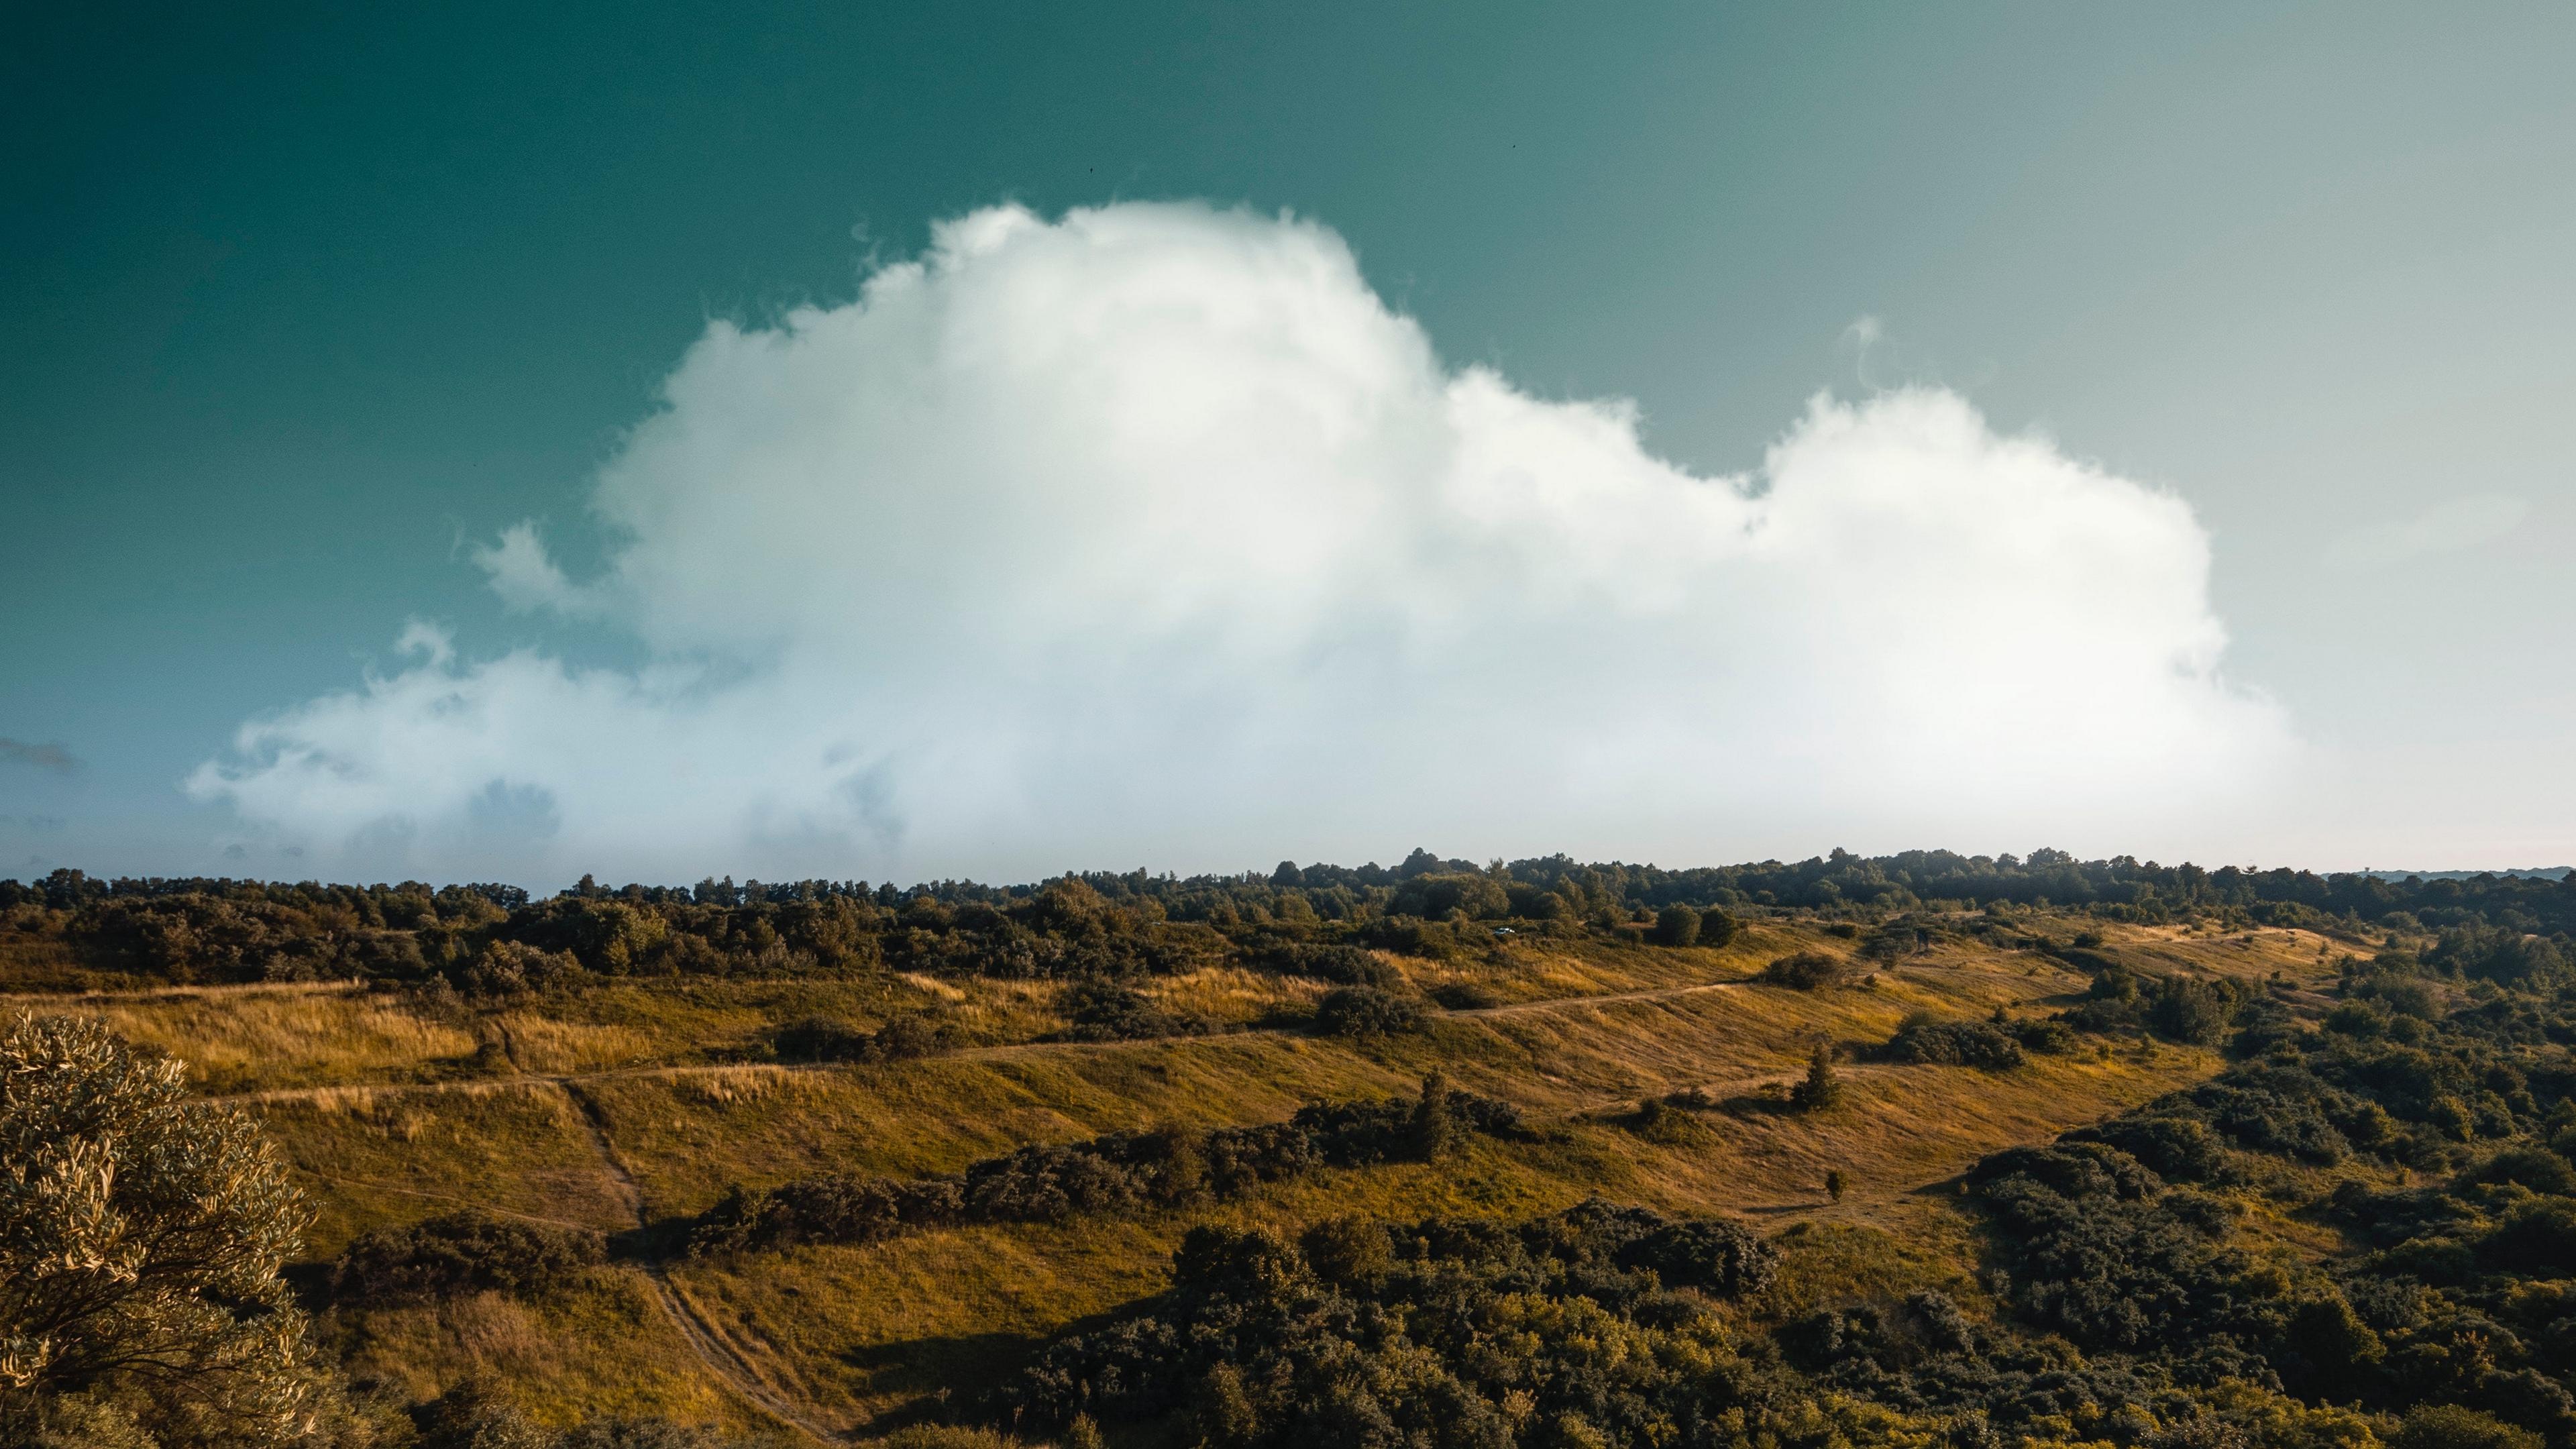 mountain sunrise clouds grass 4k 1541115410 - mountain, sunrise, clouds, grass 4k - sunrise, Mountain, Clouds